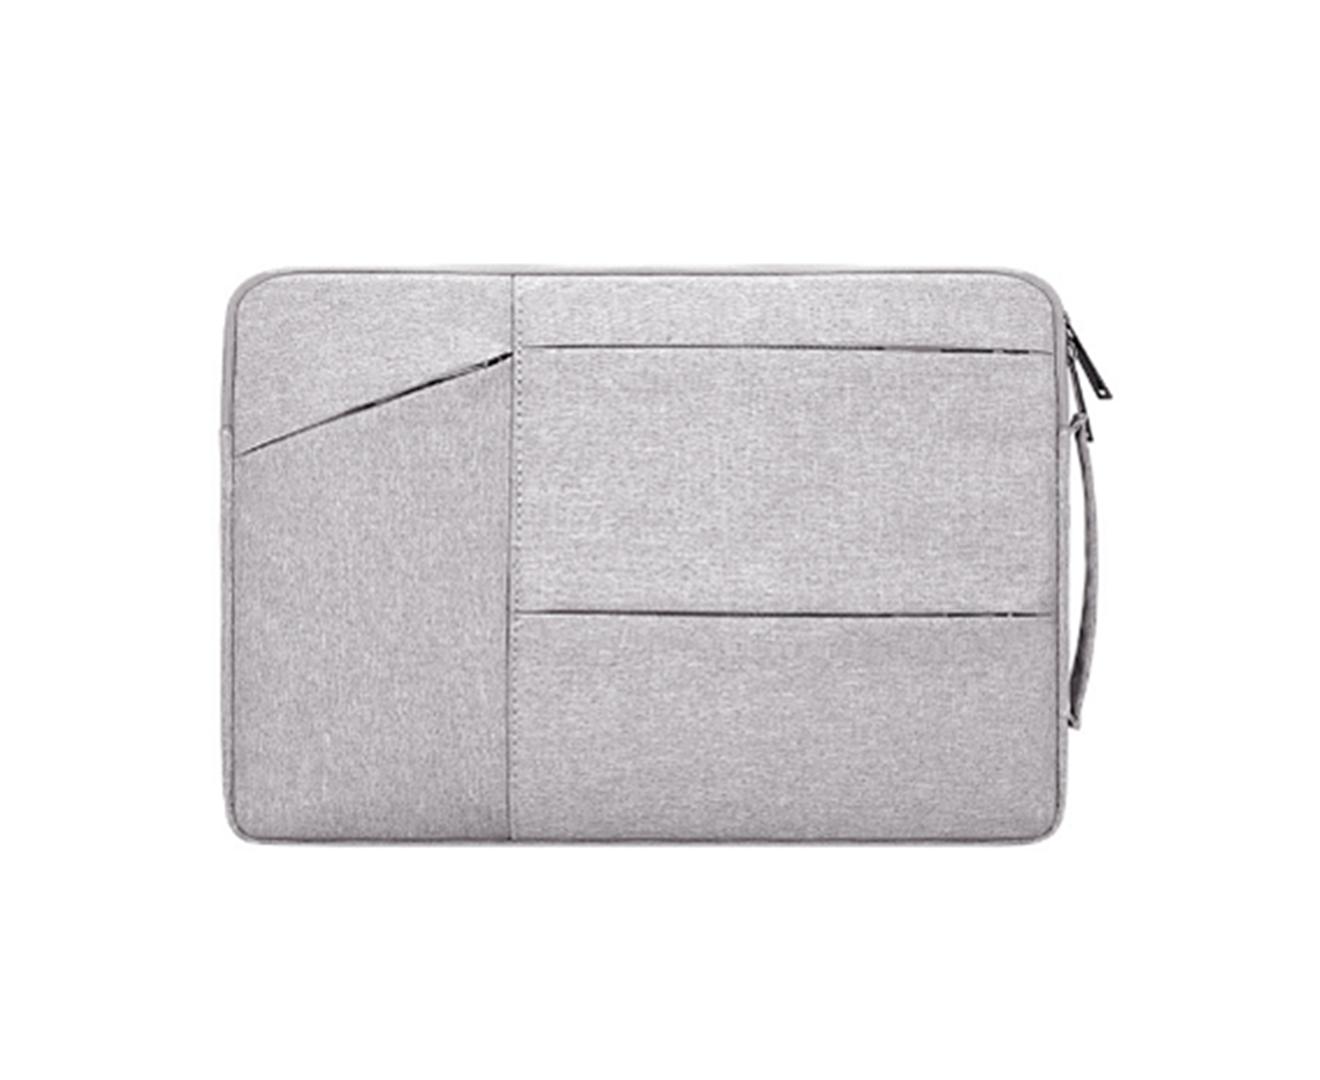 14.1 Inch Waterproof and Wear-resistant Laptop Bag Notebook Liner Bag Business Exhibition Bag-2#-Grey